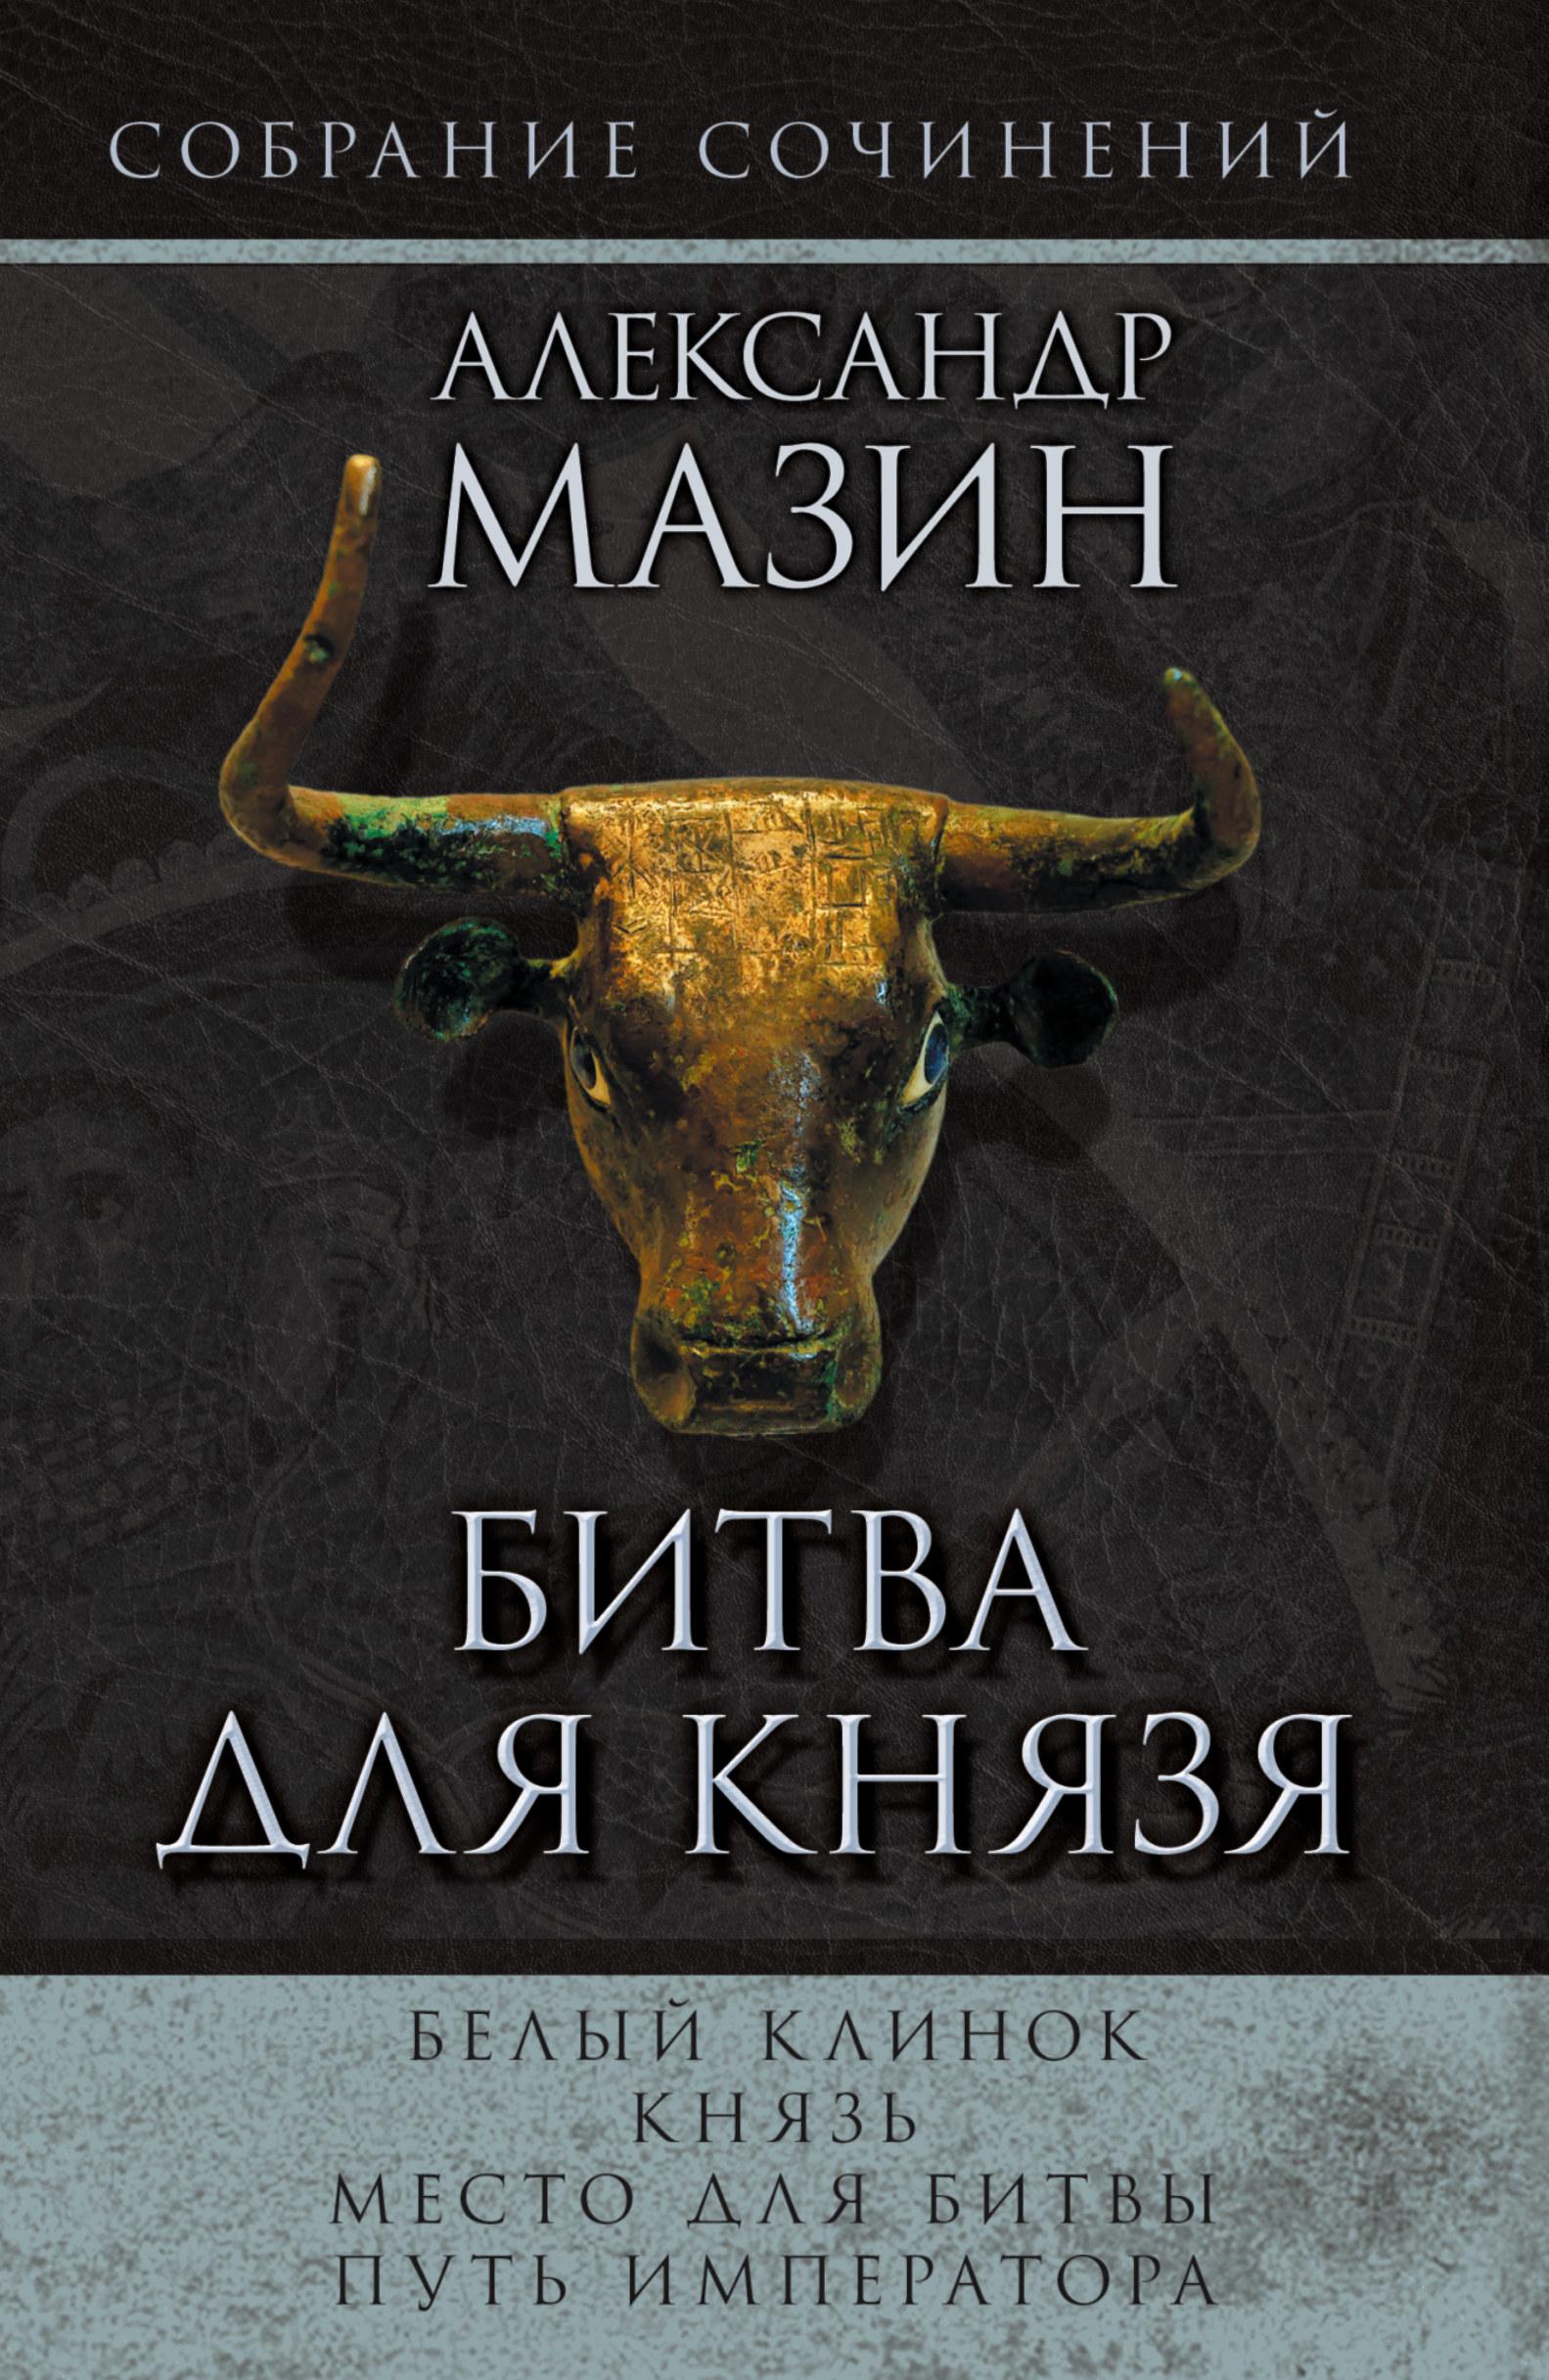 Мазин А.В. Битва для князя мазин а битва для князя комплект из 4 книг